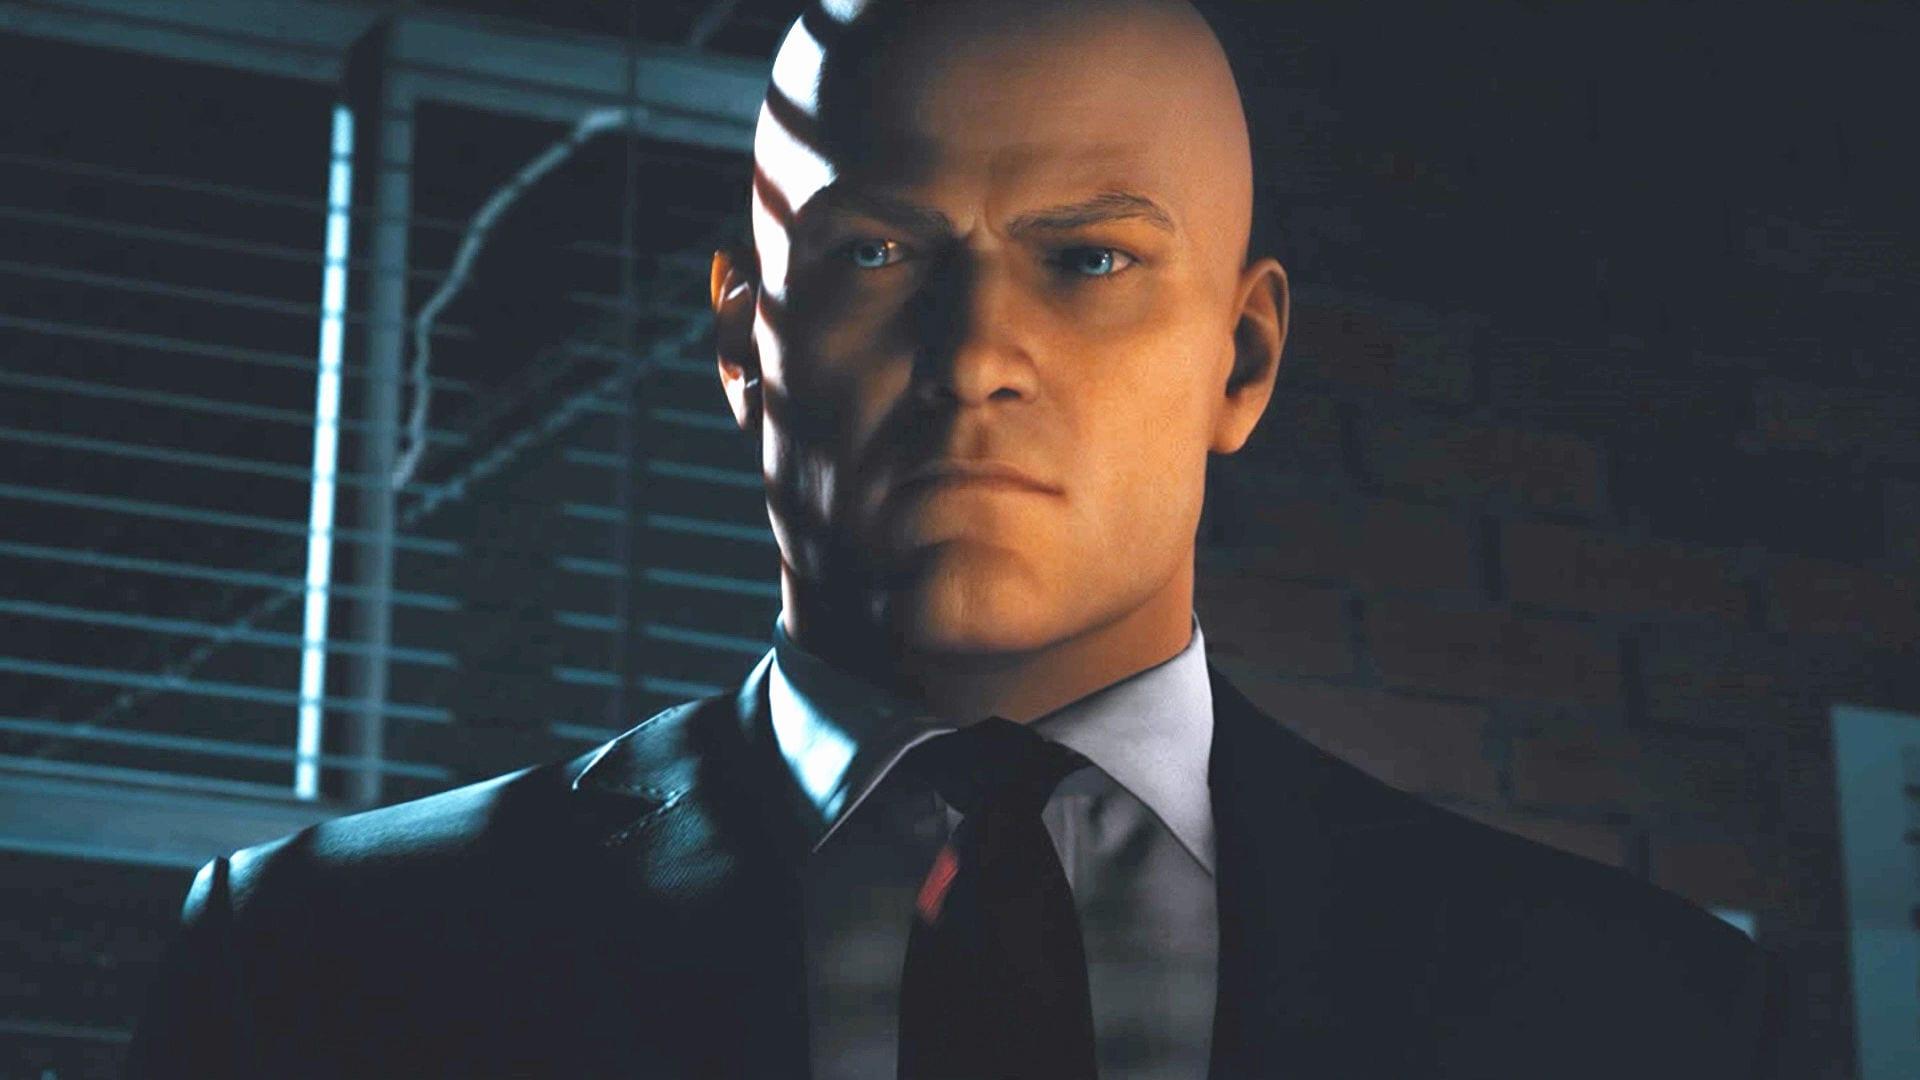 IO:《杀手》系列将暂停一段时间 全力打造007新作